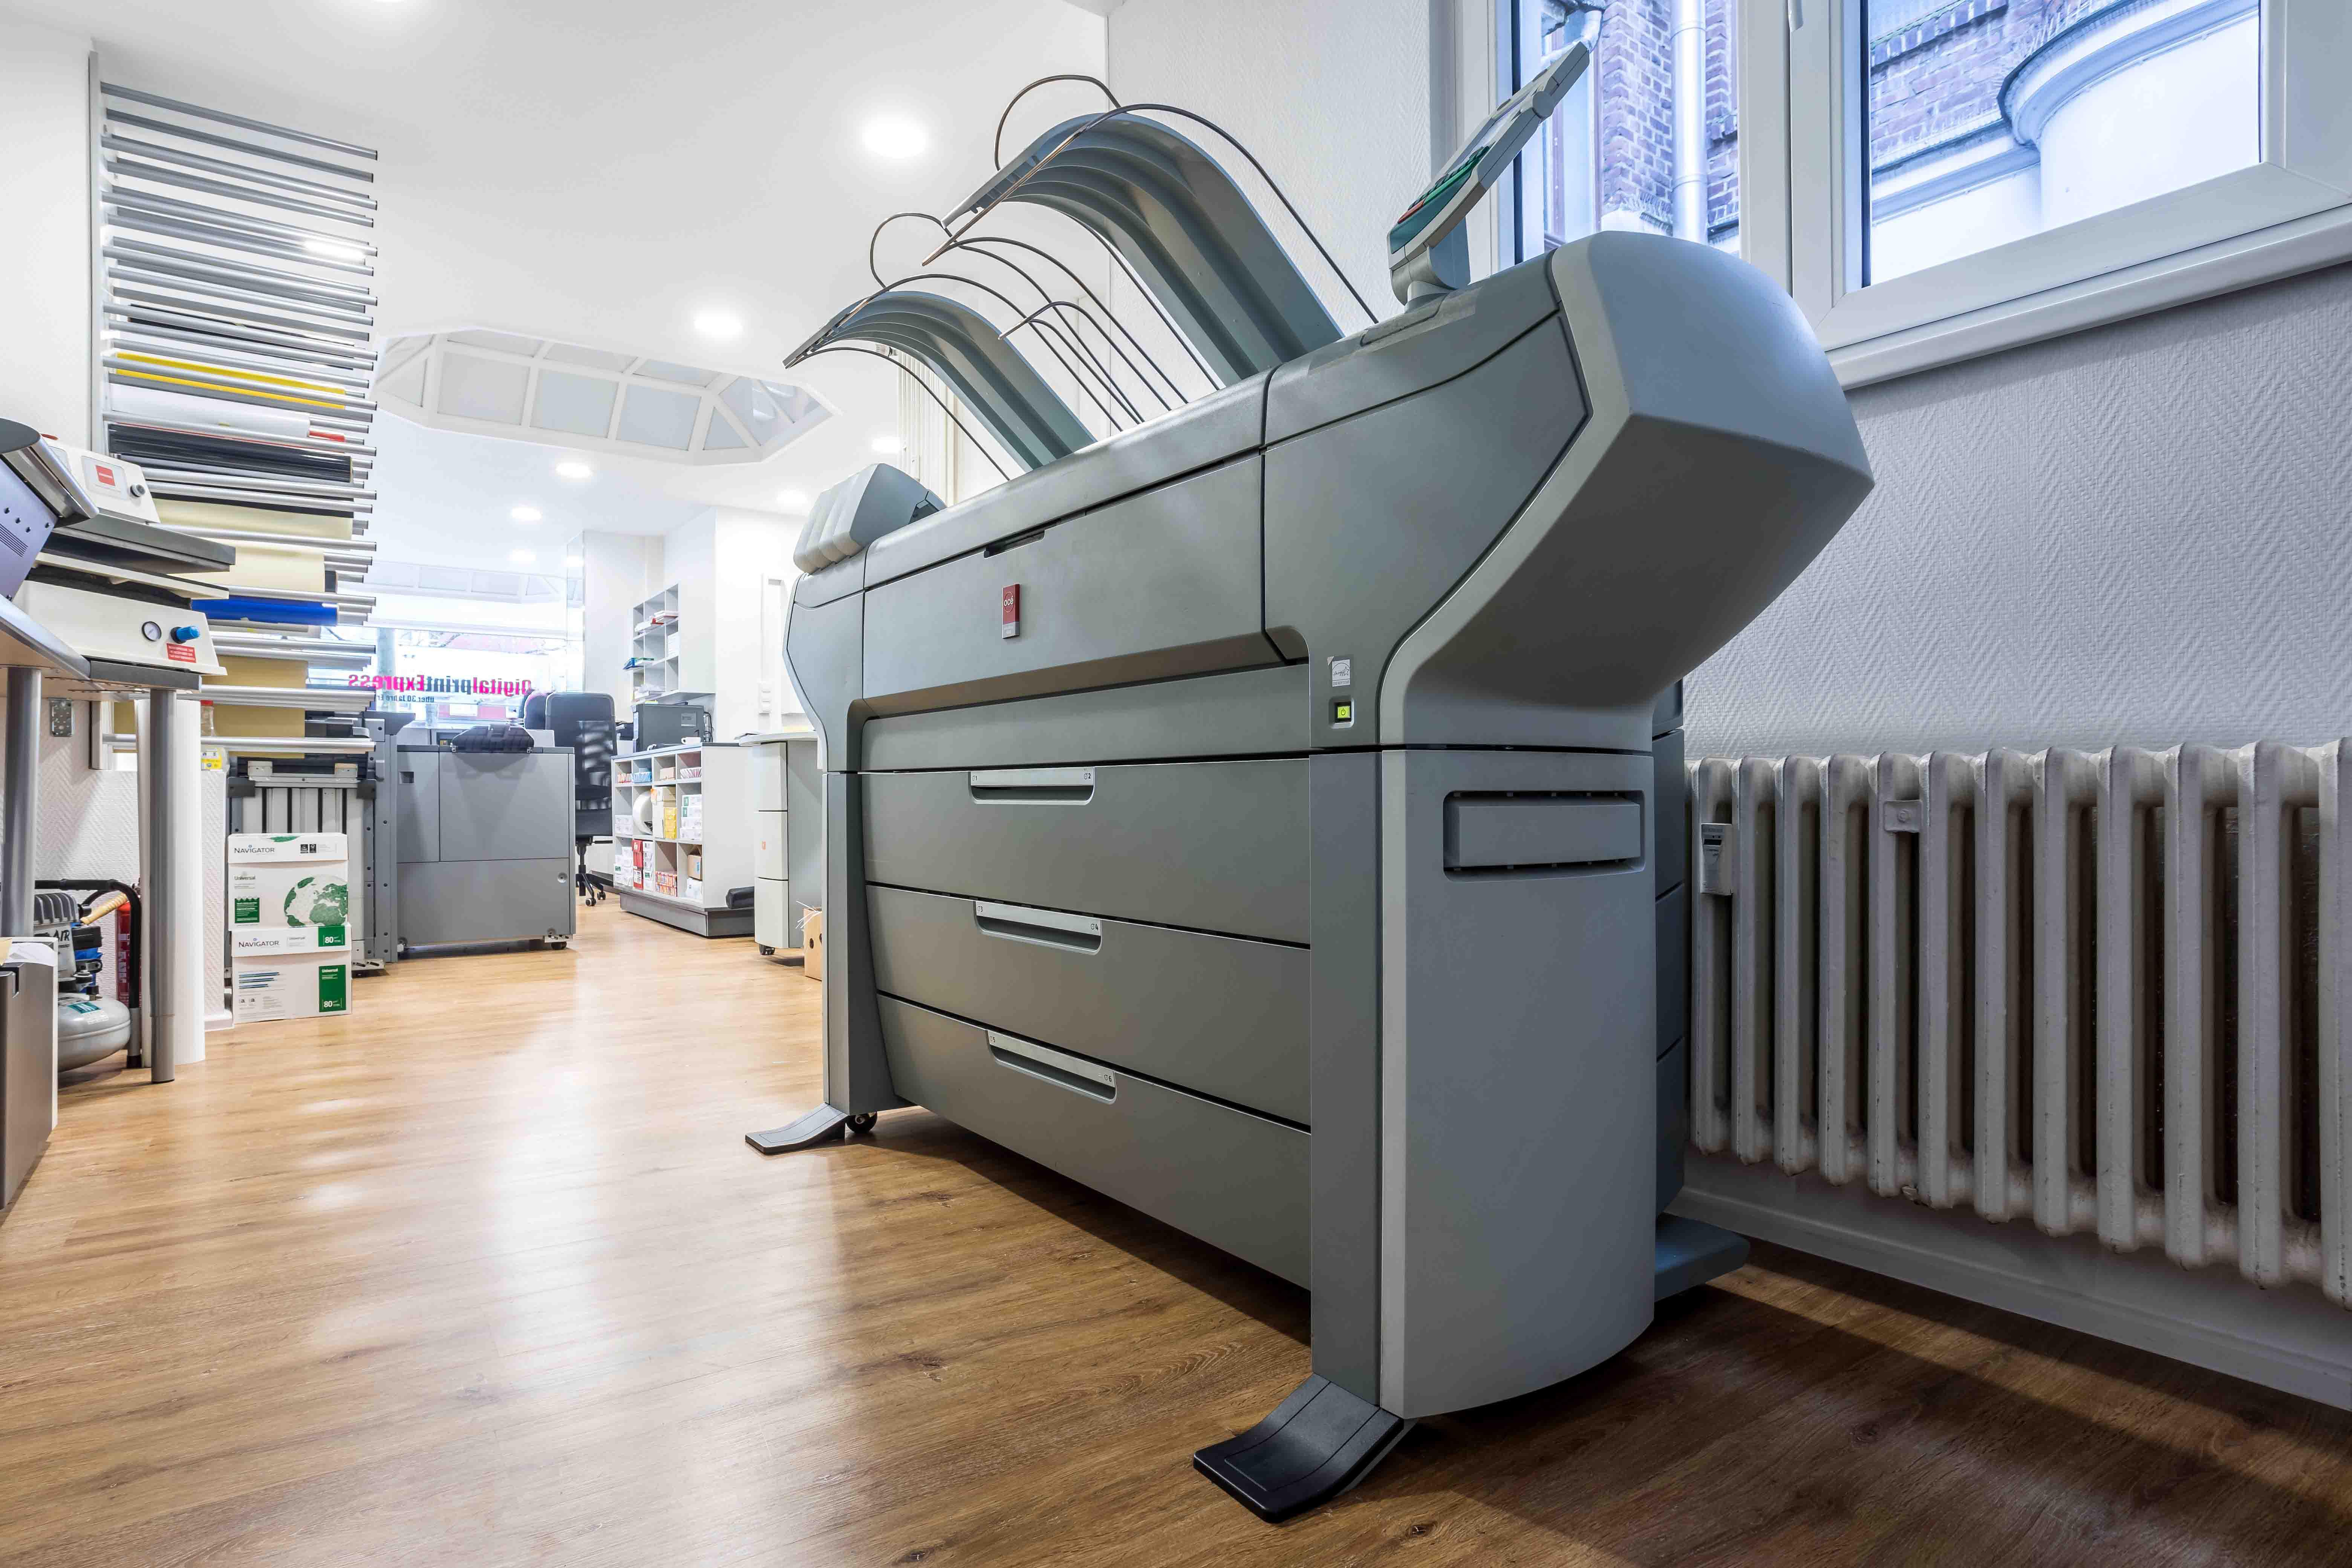 Digitalprint Express Digitaldruck, Schilder, Werbetechnik  & Copyshop Bonn Rhein Sieg Bonn